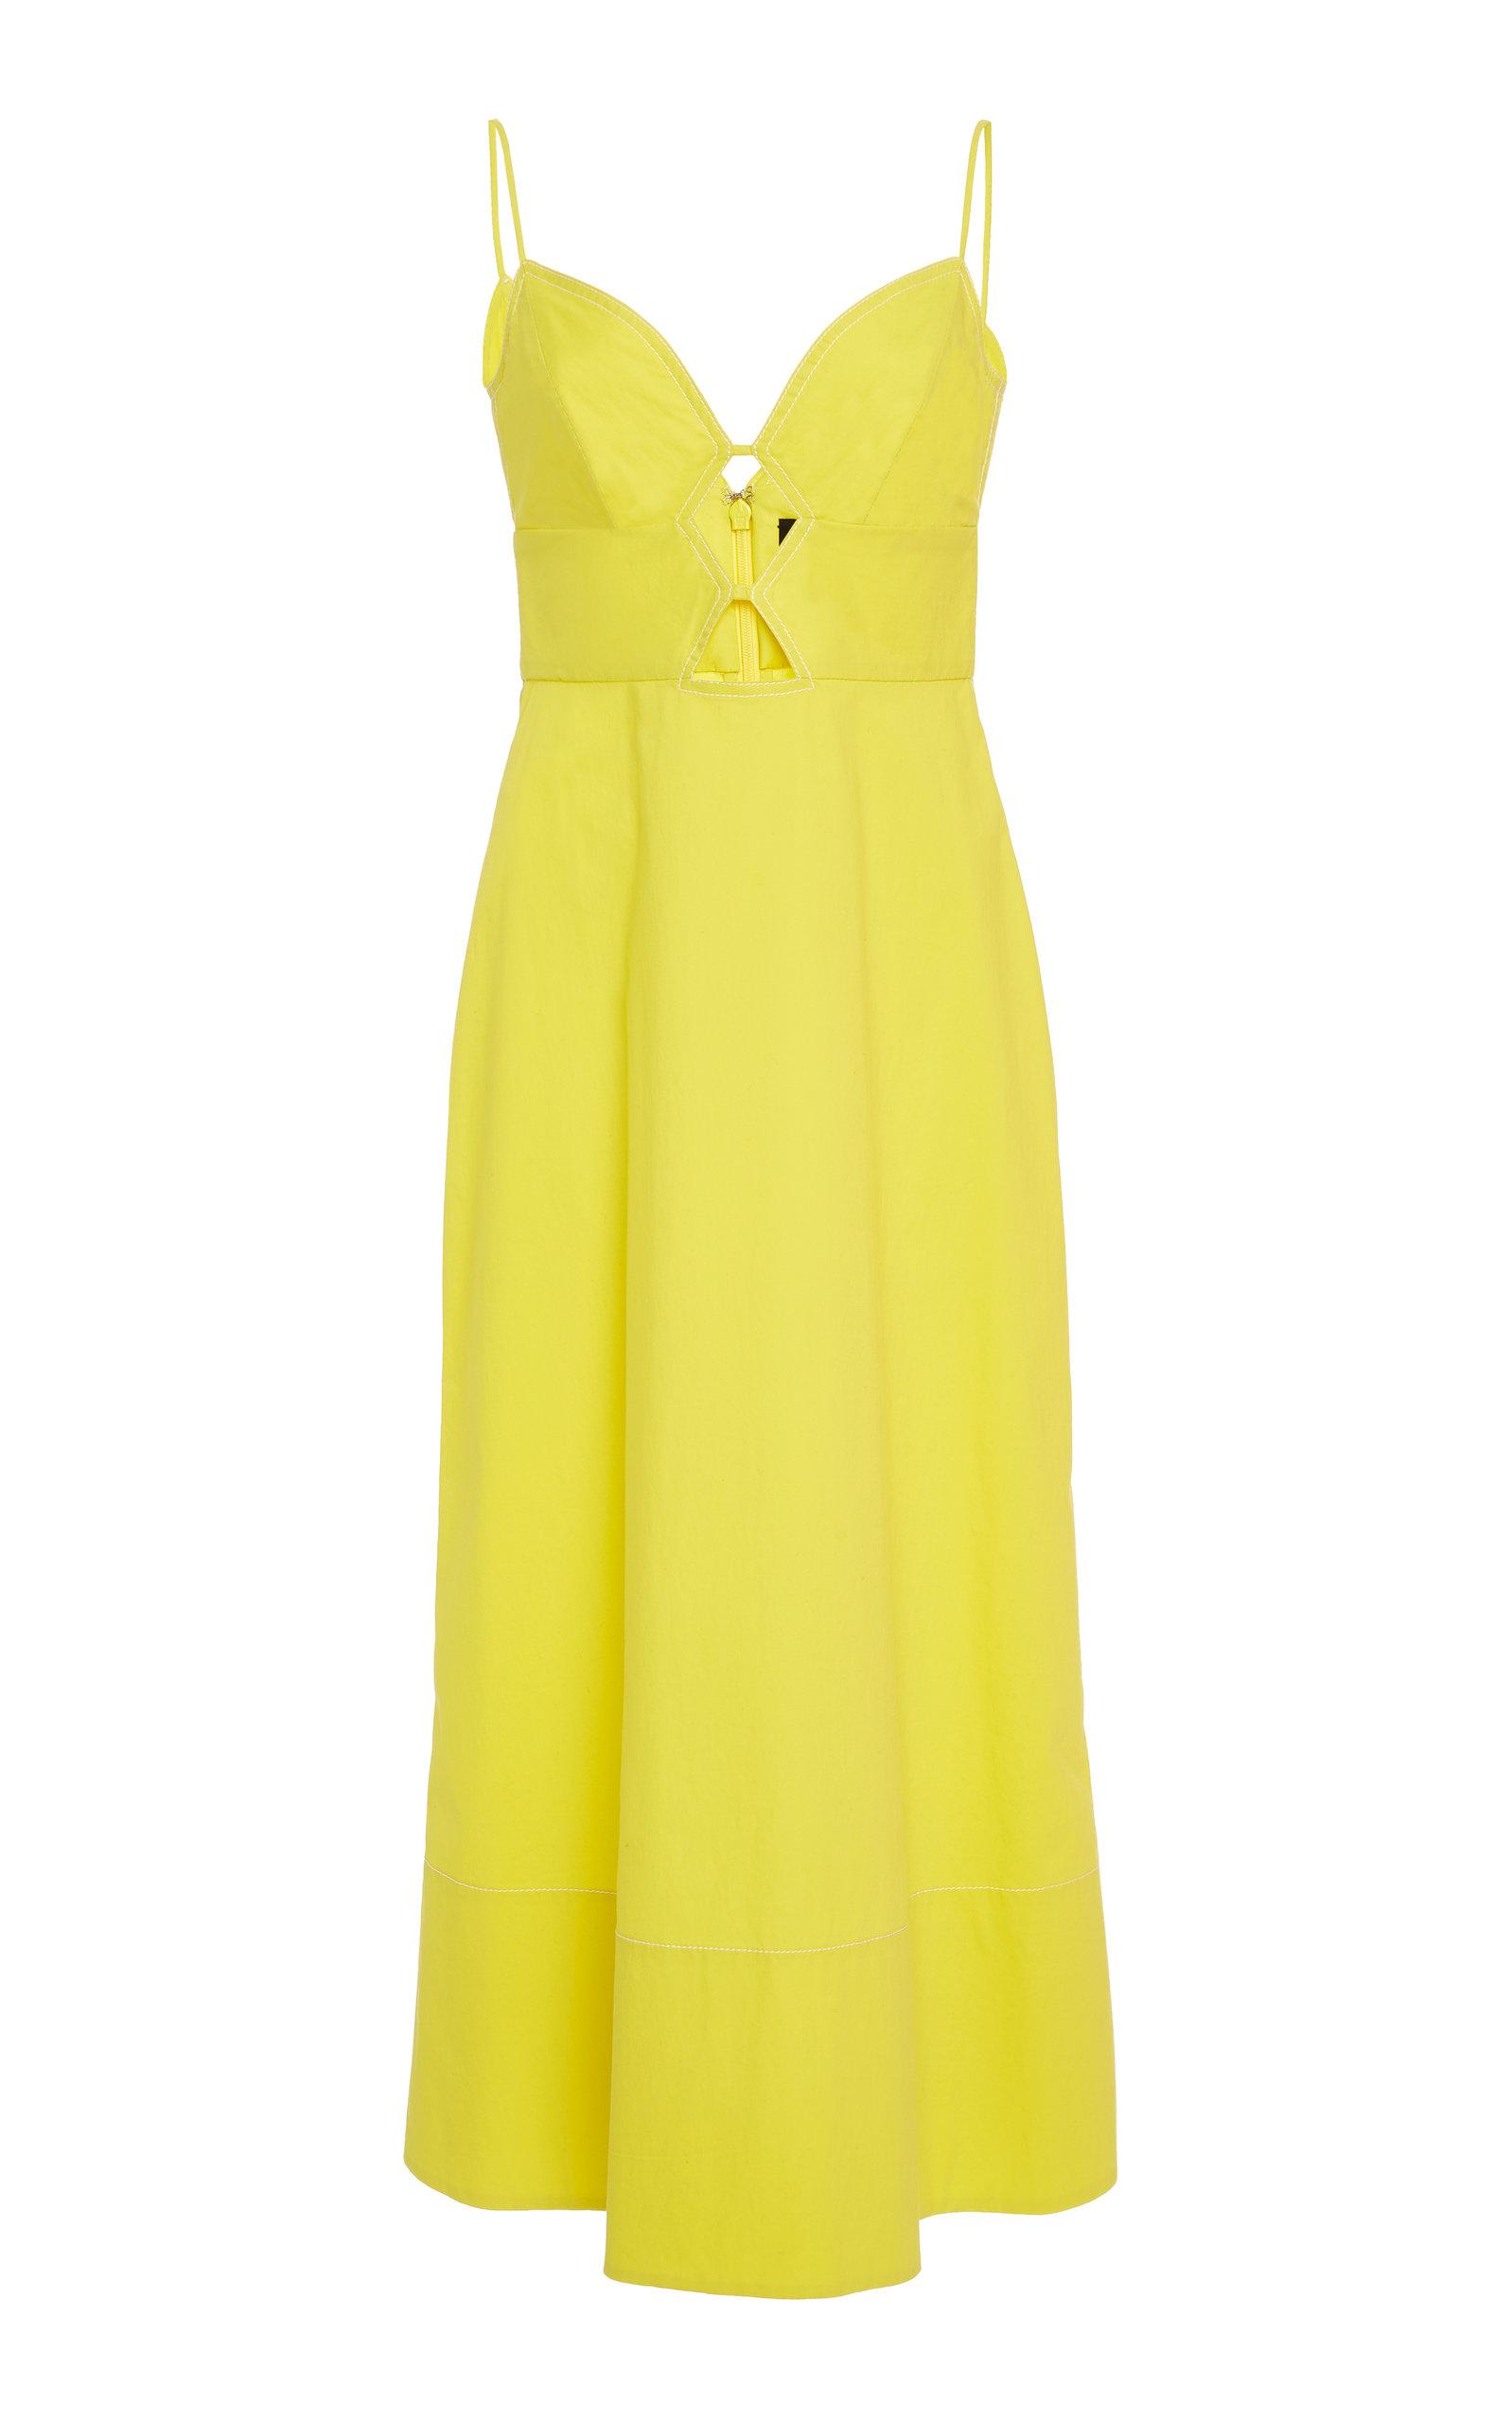 SALONI Jana Cutout Midi Dress in Bright Lemon